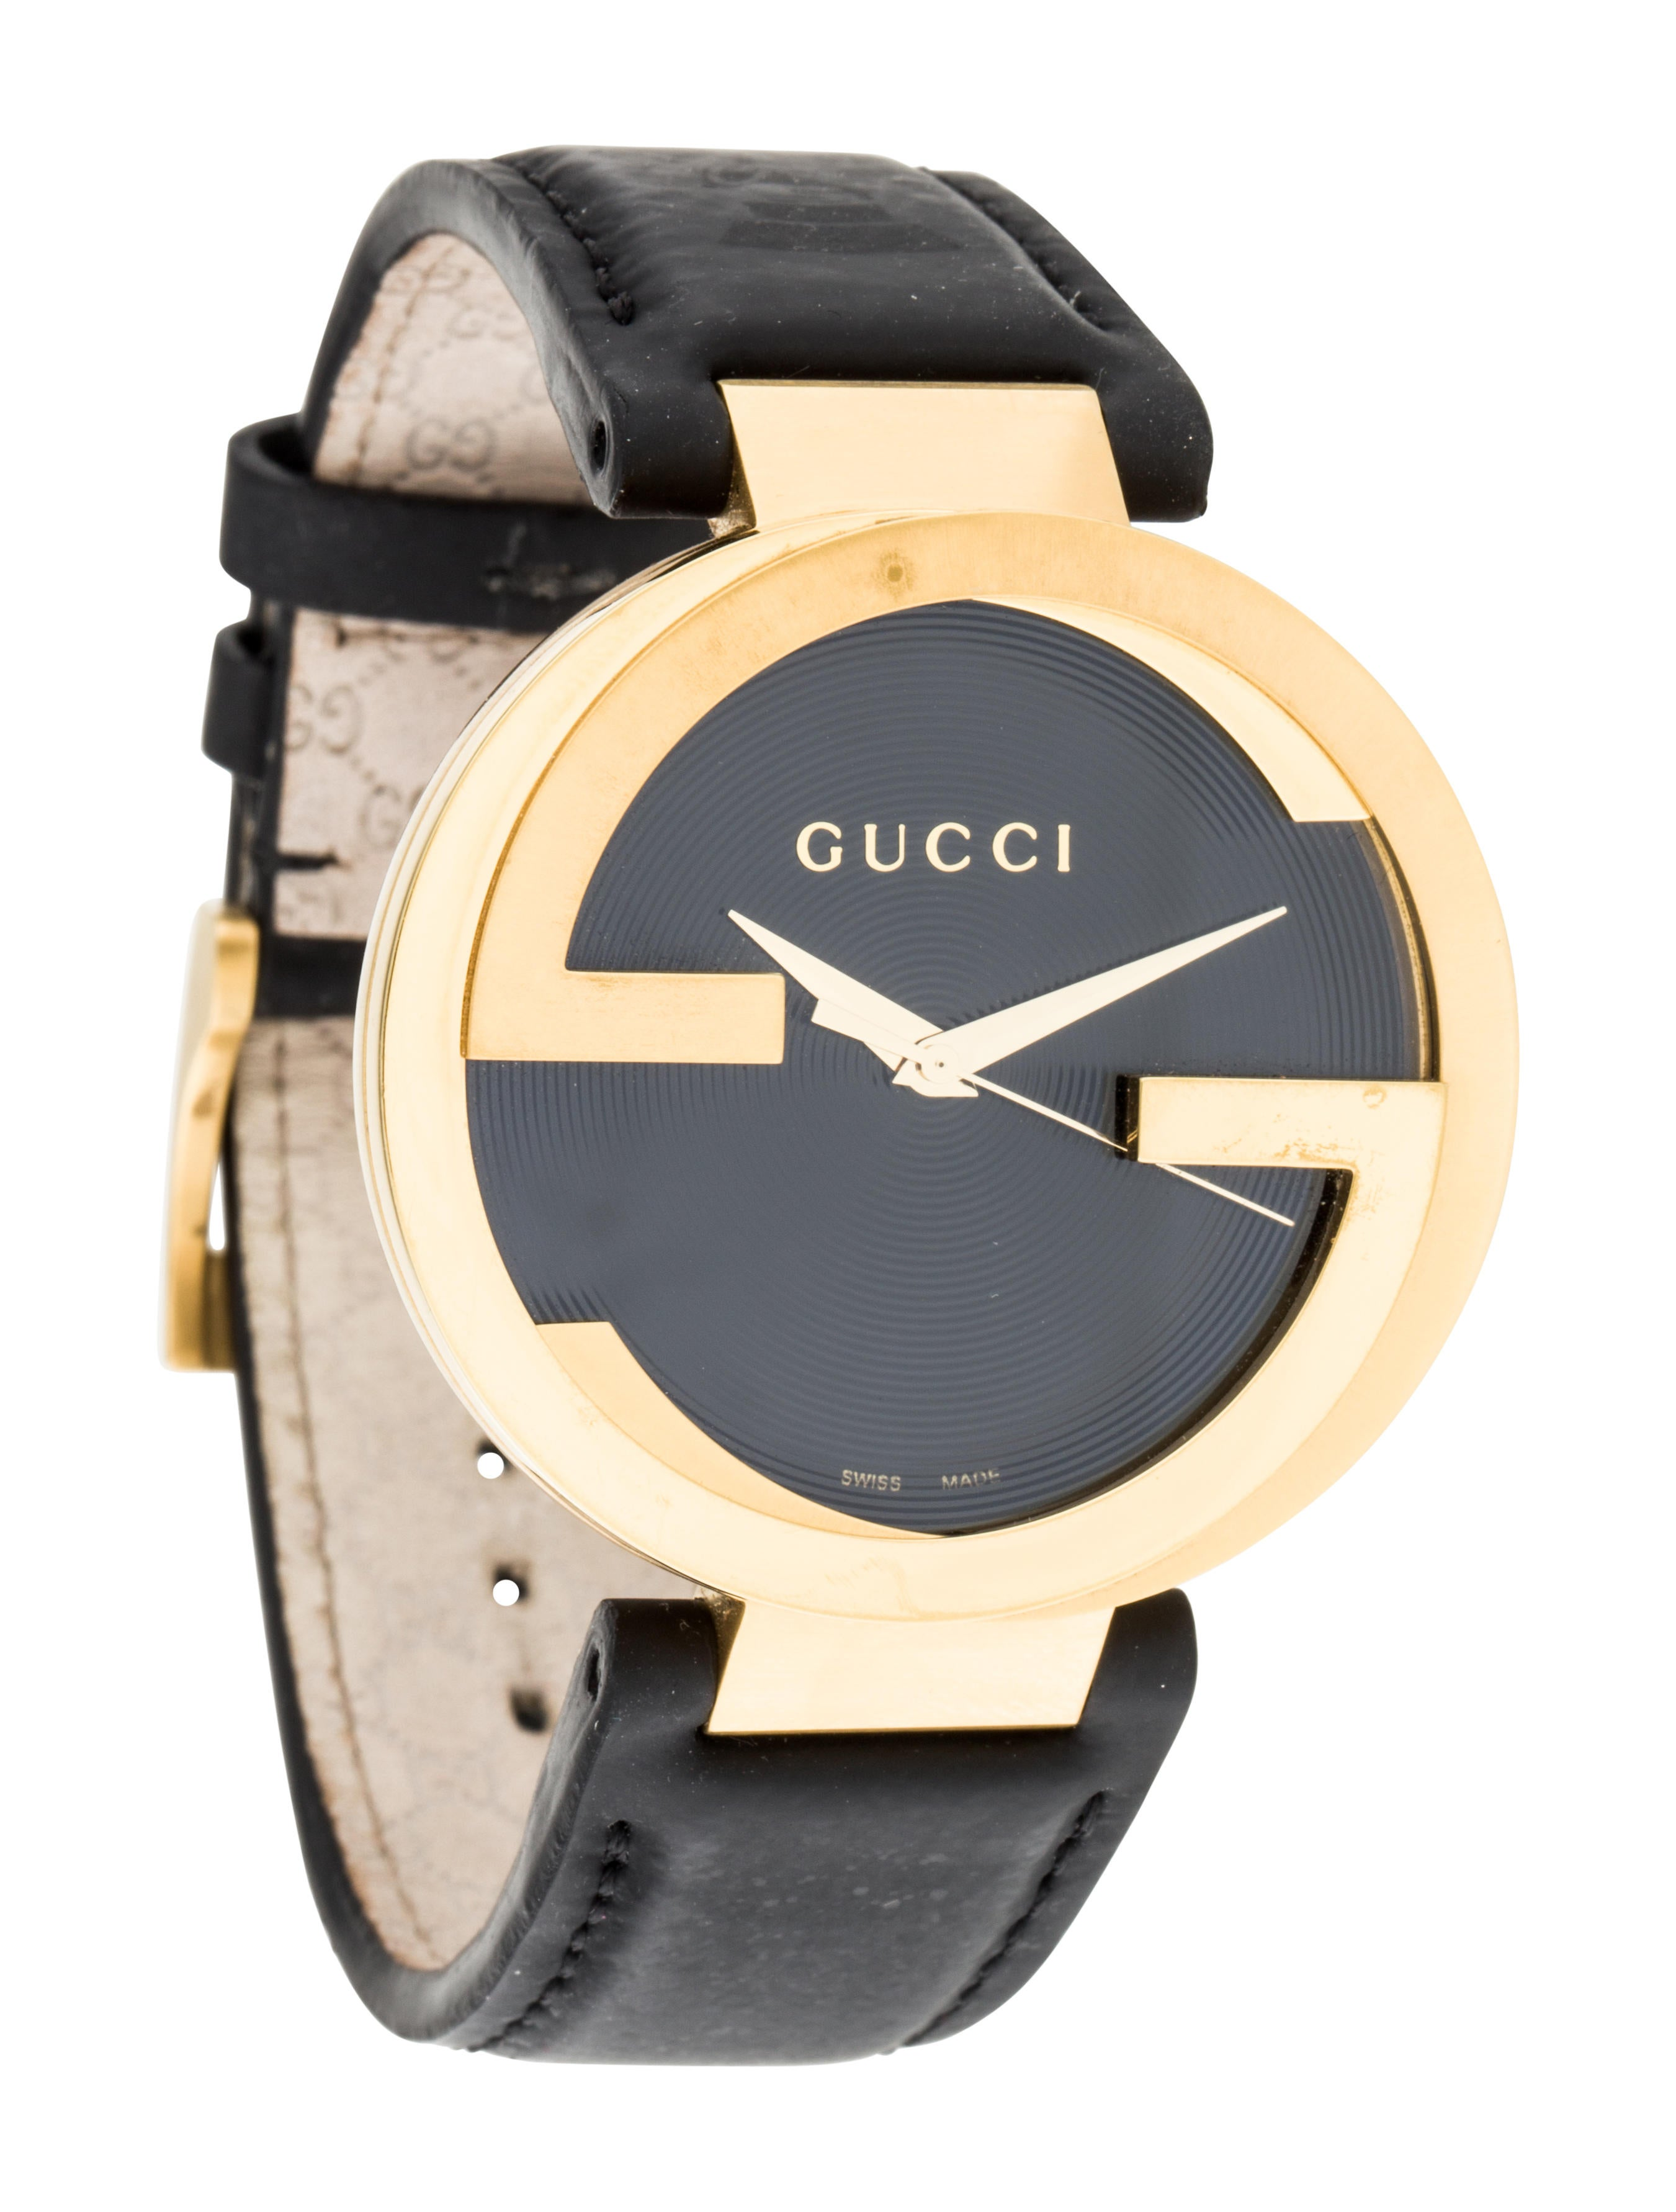 5d3dce4e327 Gucci Interlocking Latin Grammy Special Edition Watch - Strap ...